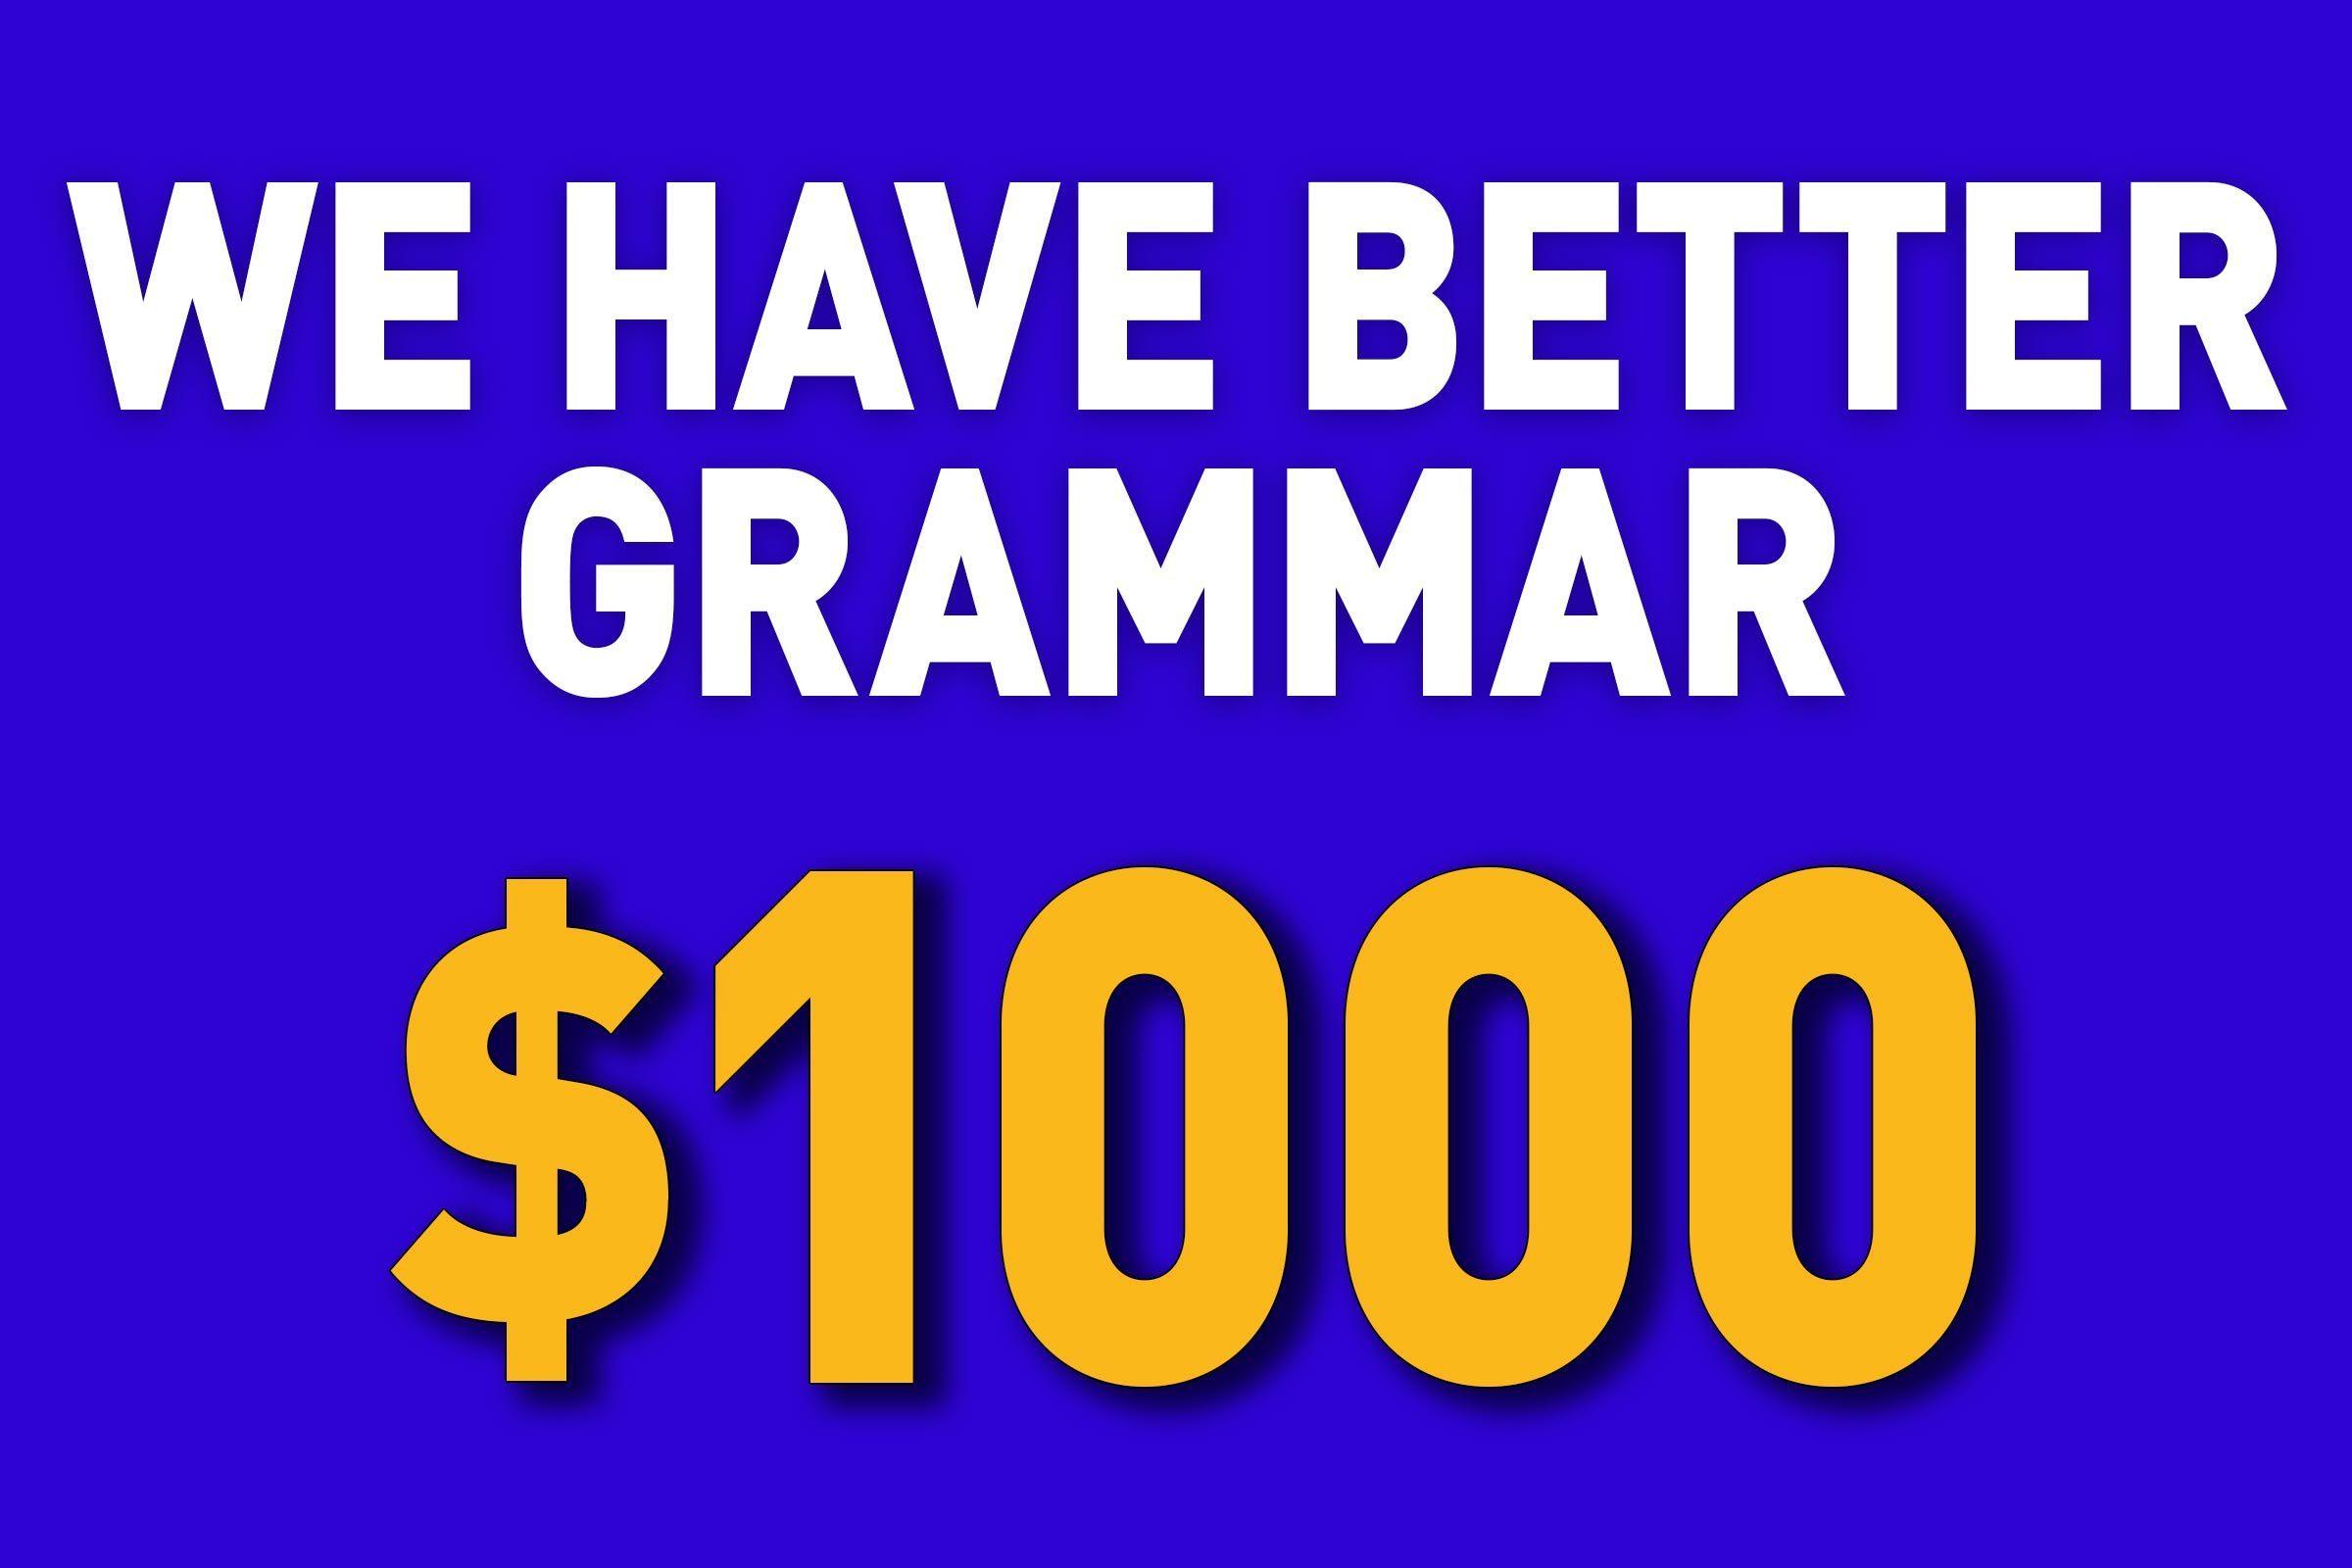 We have better grammar for $1000